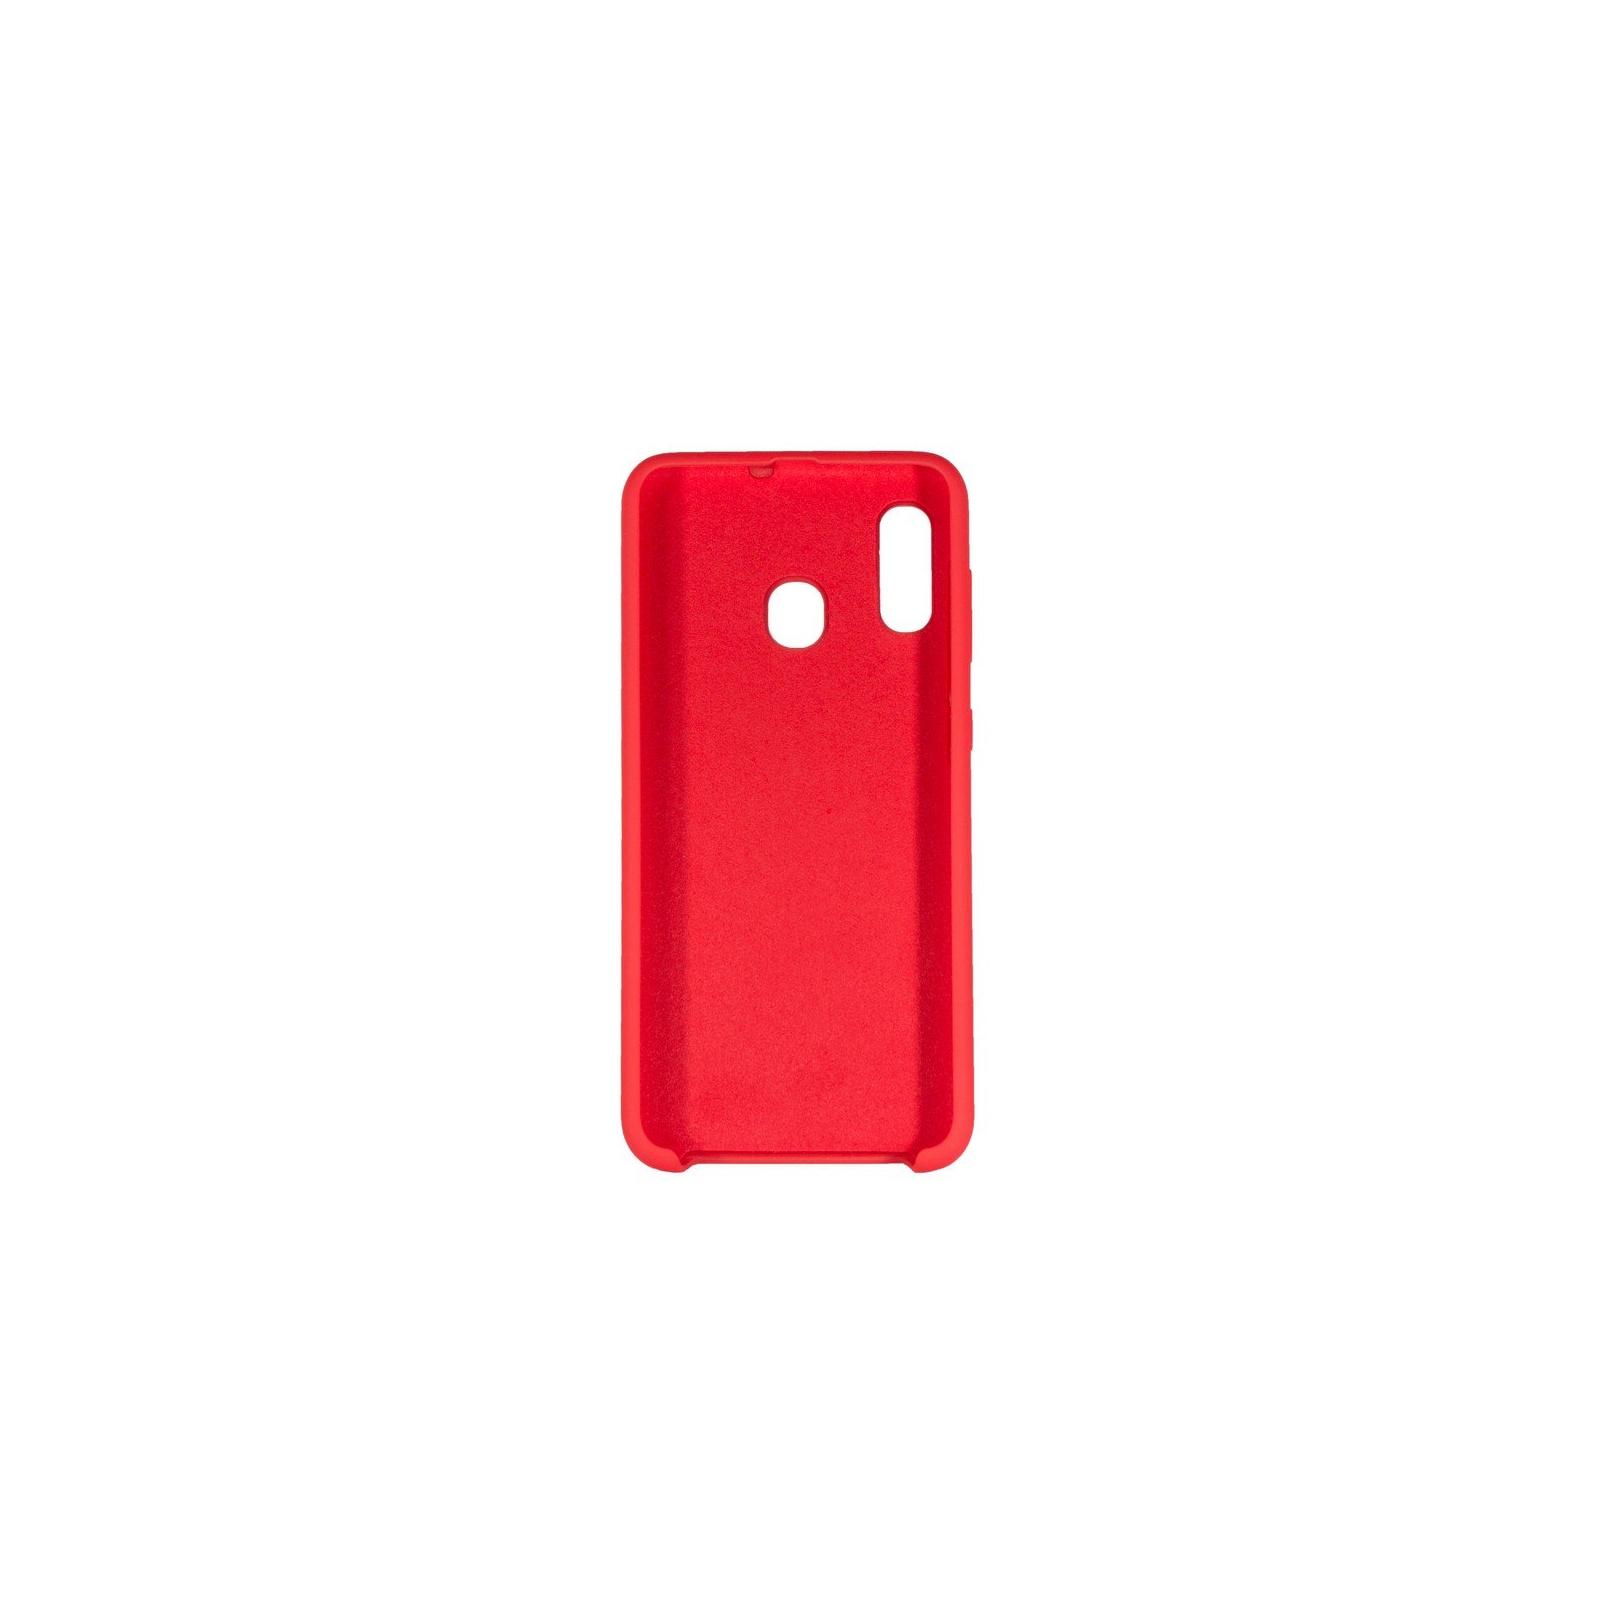 Чехол для моб. телефона ColorWay ColorWay Liquid Silicone для Samsung Galaxy A30 Red (CW-CLSSGA305-RD) изображение 2